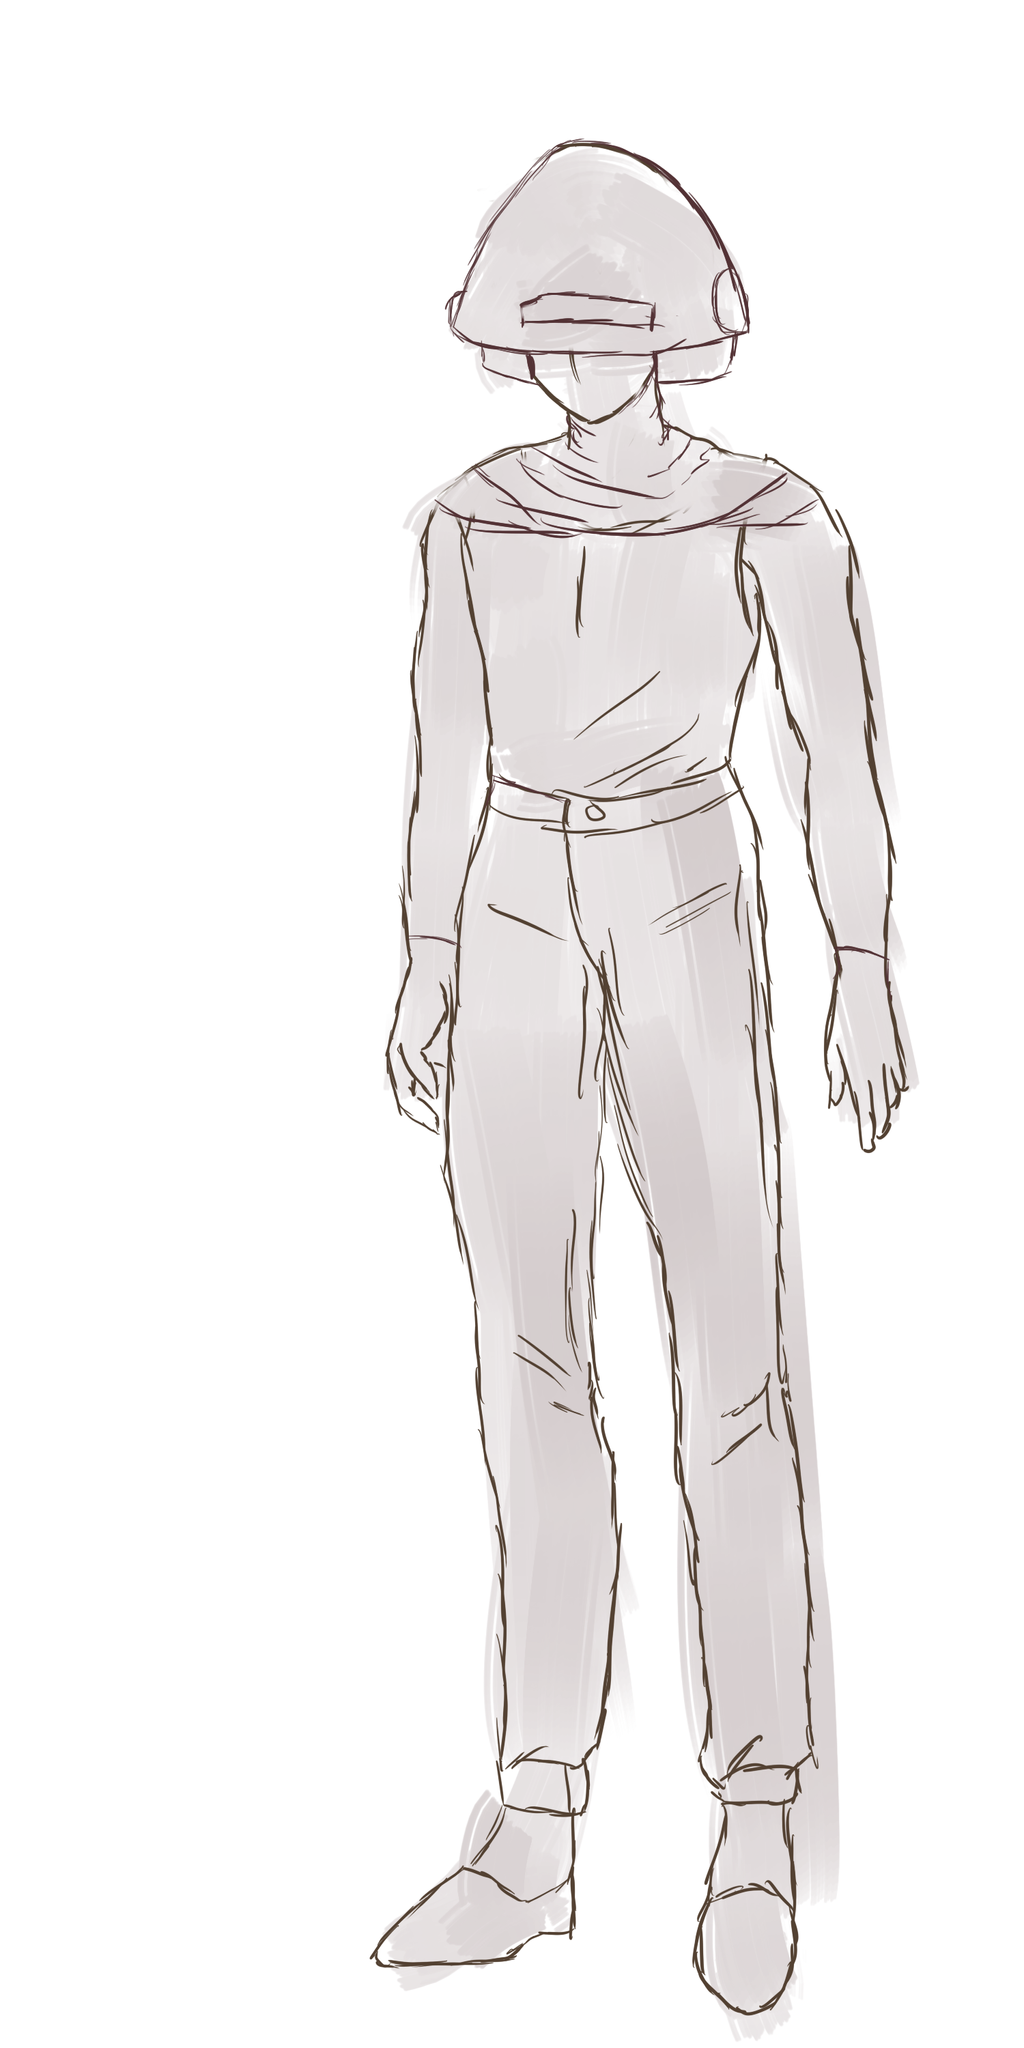 Lyorta Concept Art: Azurian Draft Soldier Gear by JayceRan